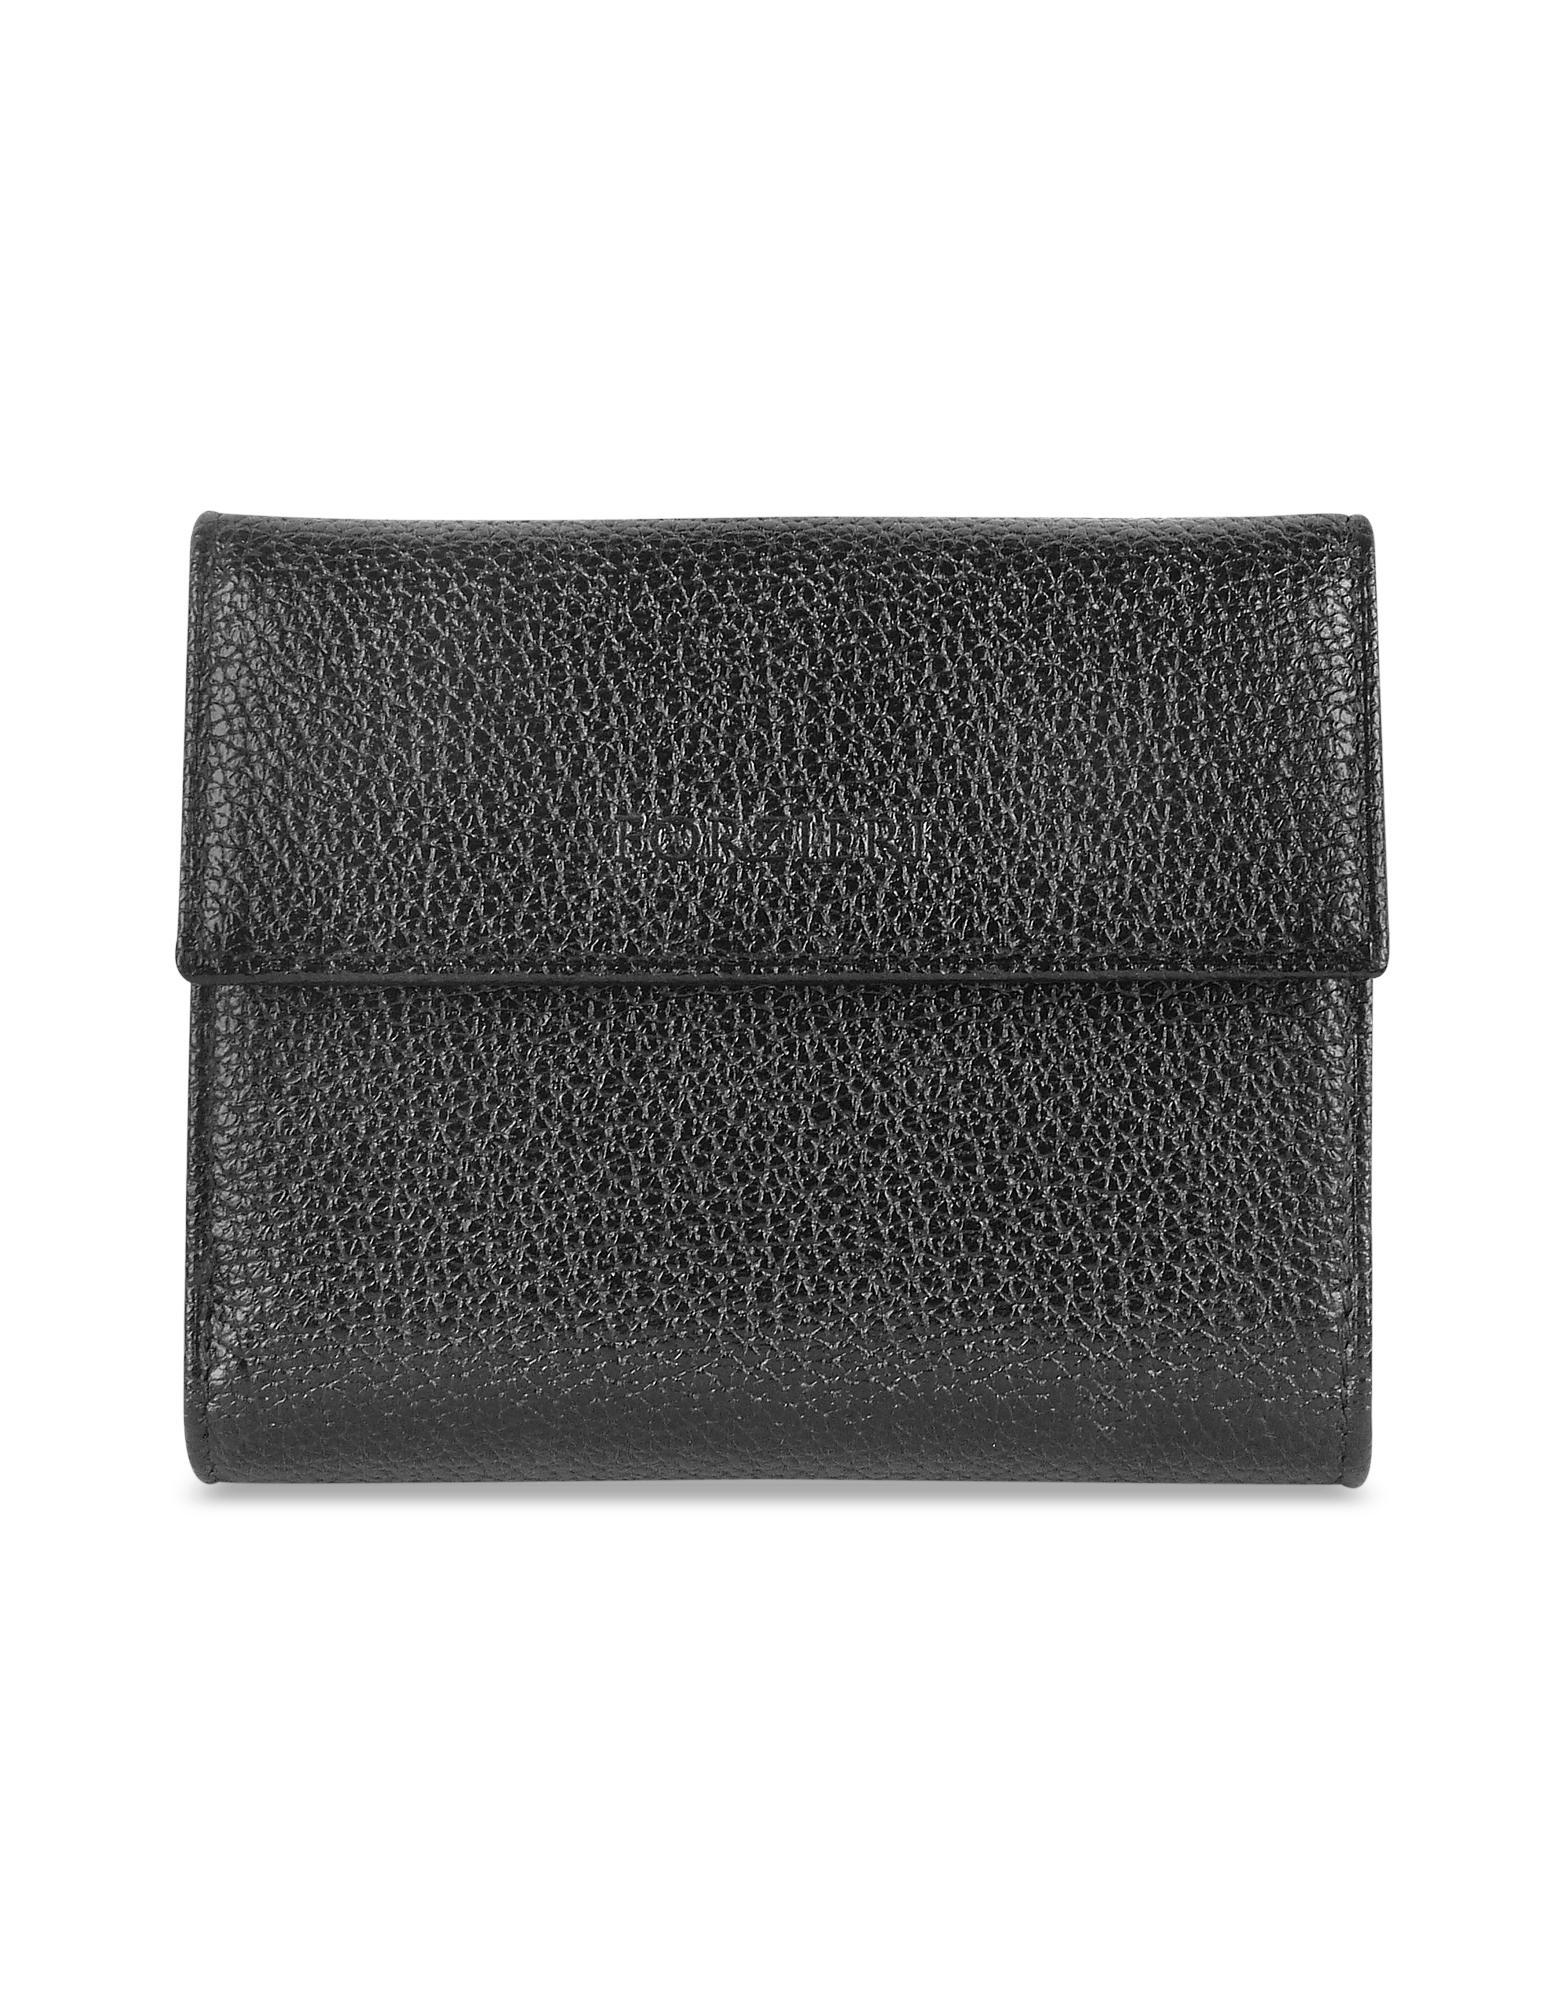 Forzieri Women's Pebble Italian Leather French Purse Wallet